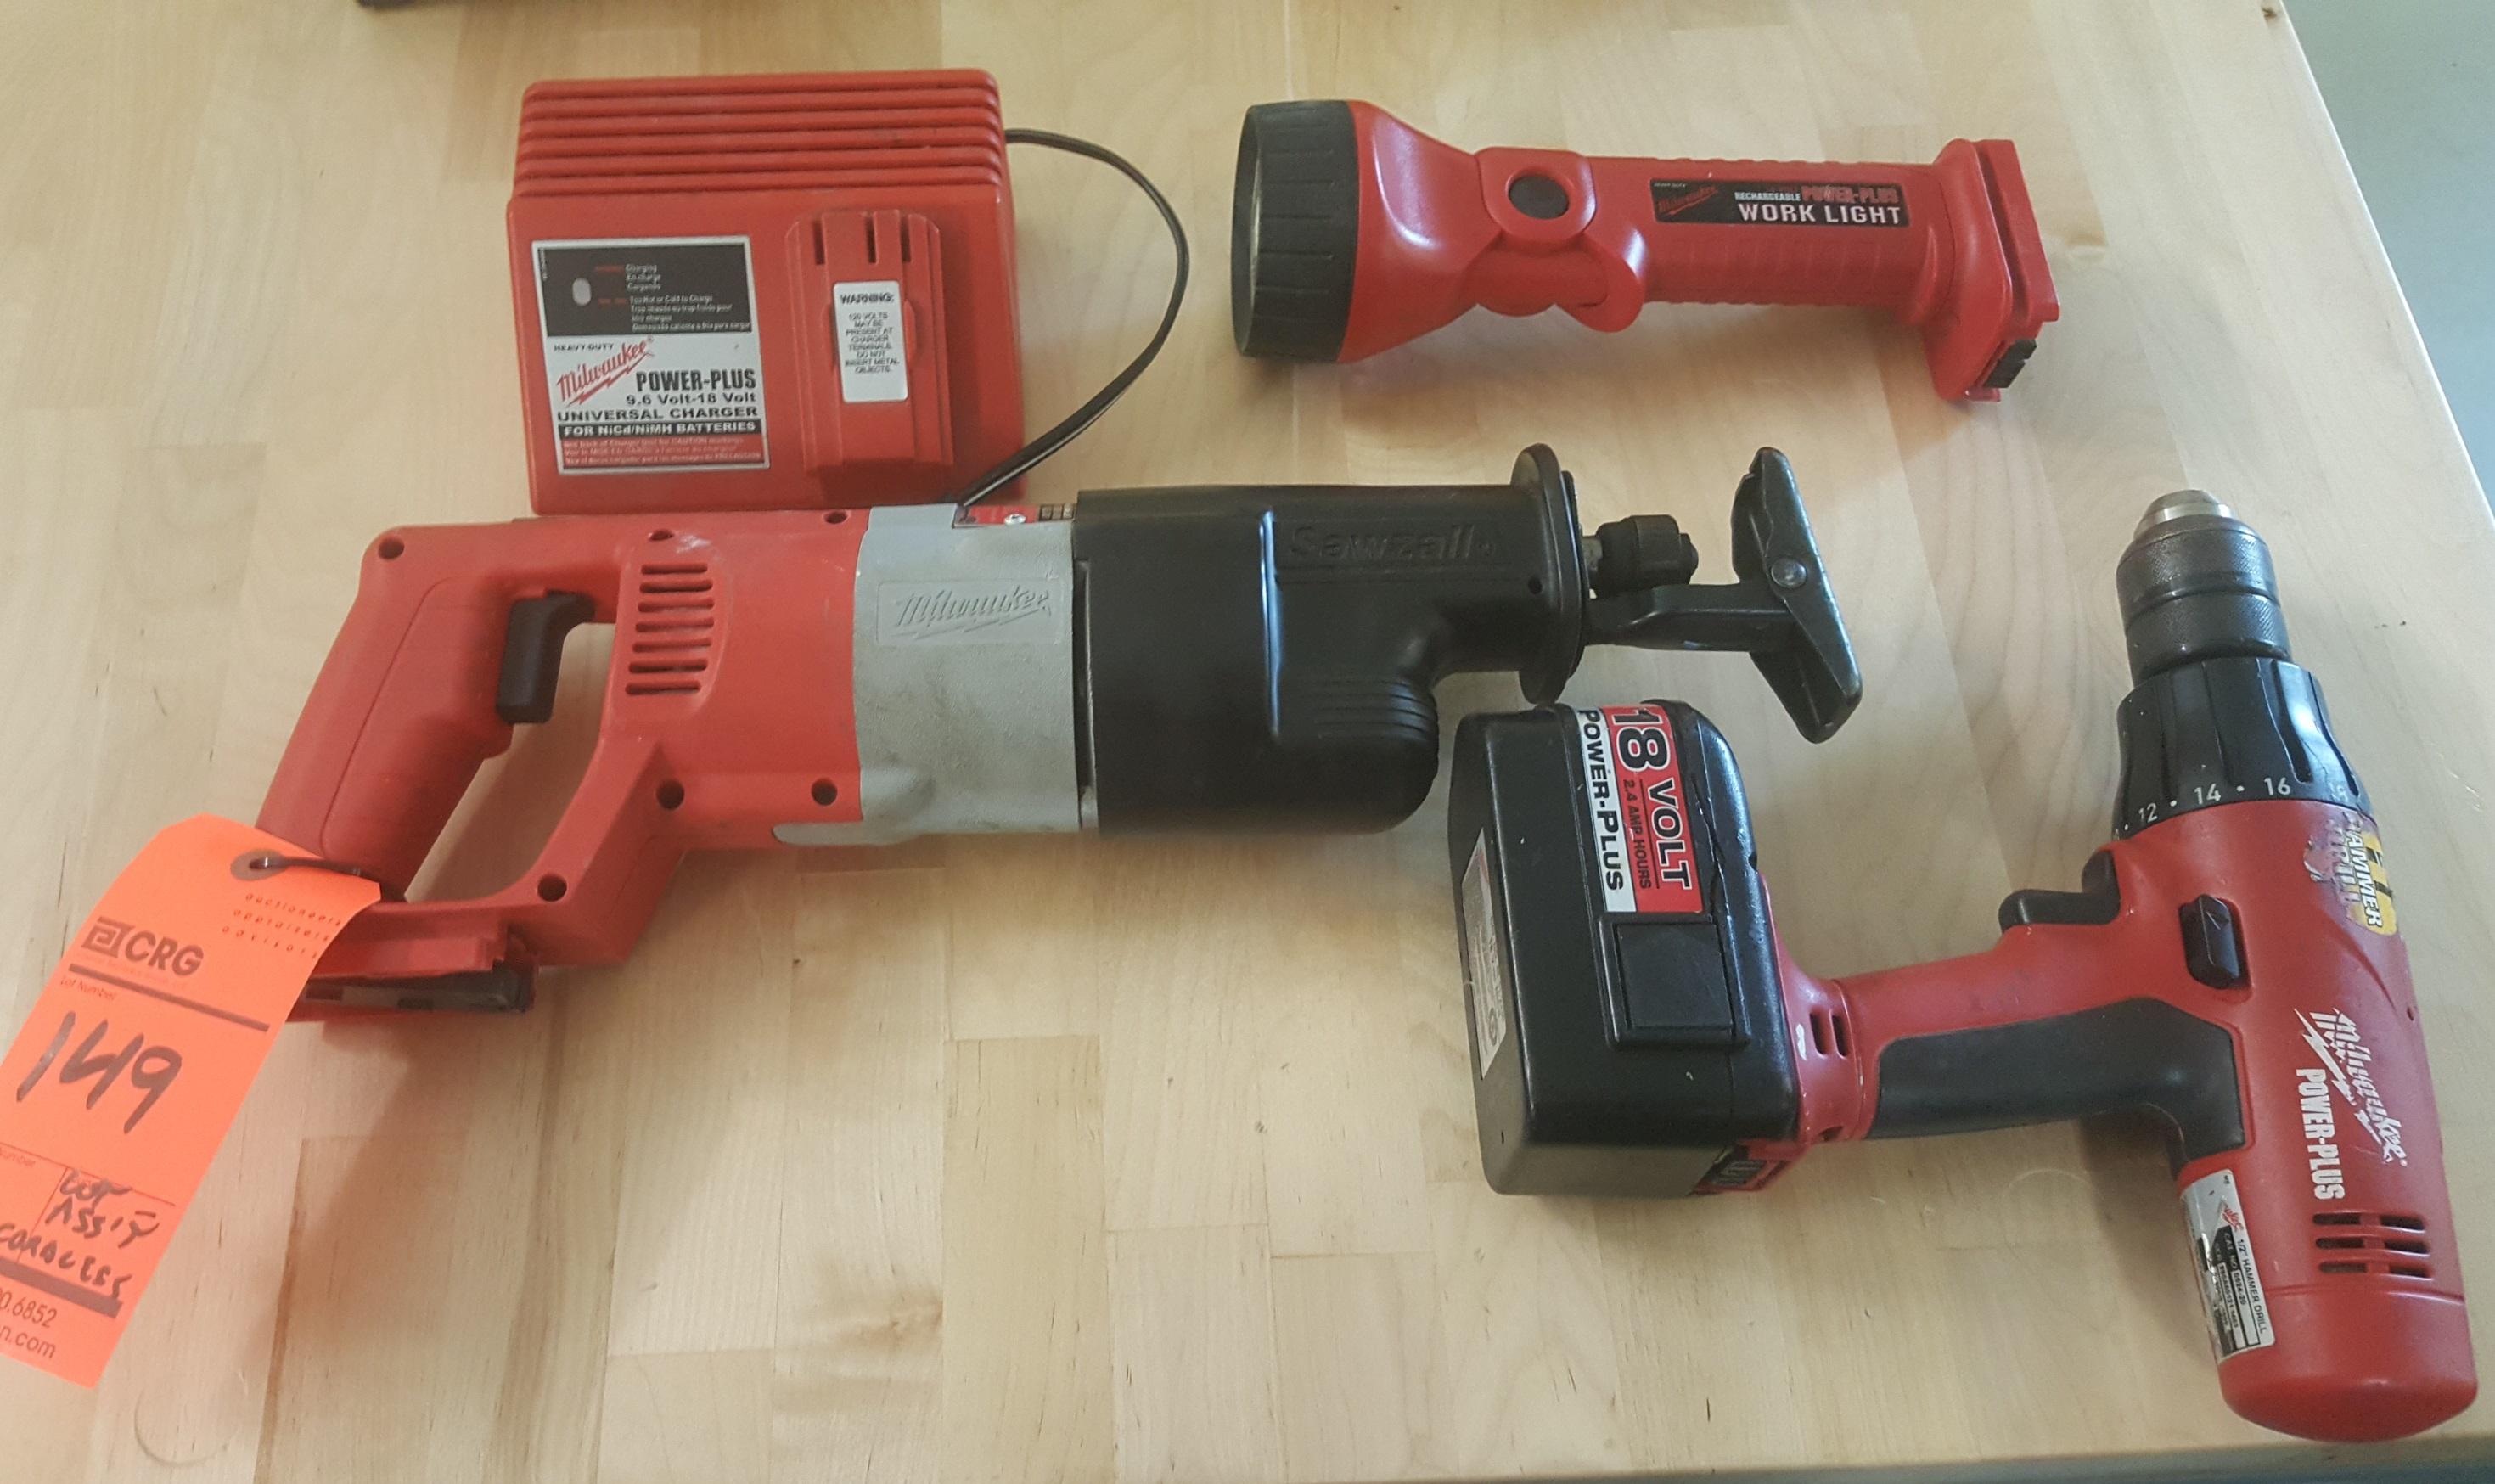 Lot 149 - MILAWAUKEE cordless Sawzall, MILWAUKEE cordless driver and MILWAUKEE flashlight with battery and